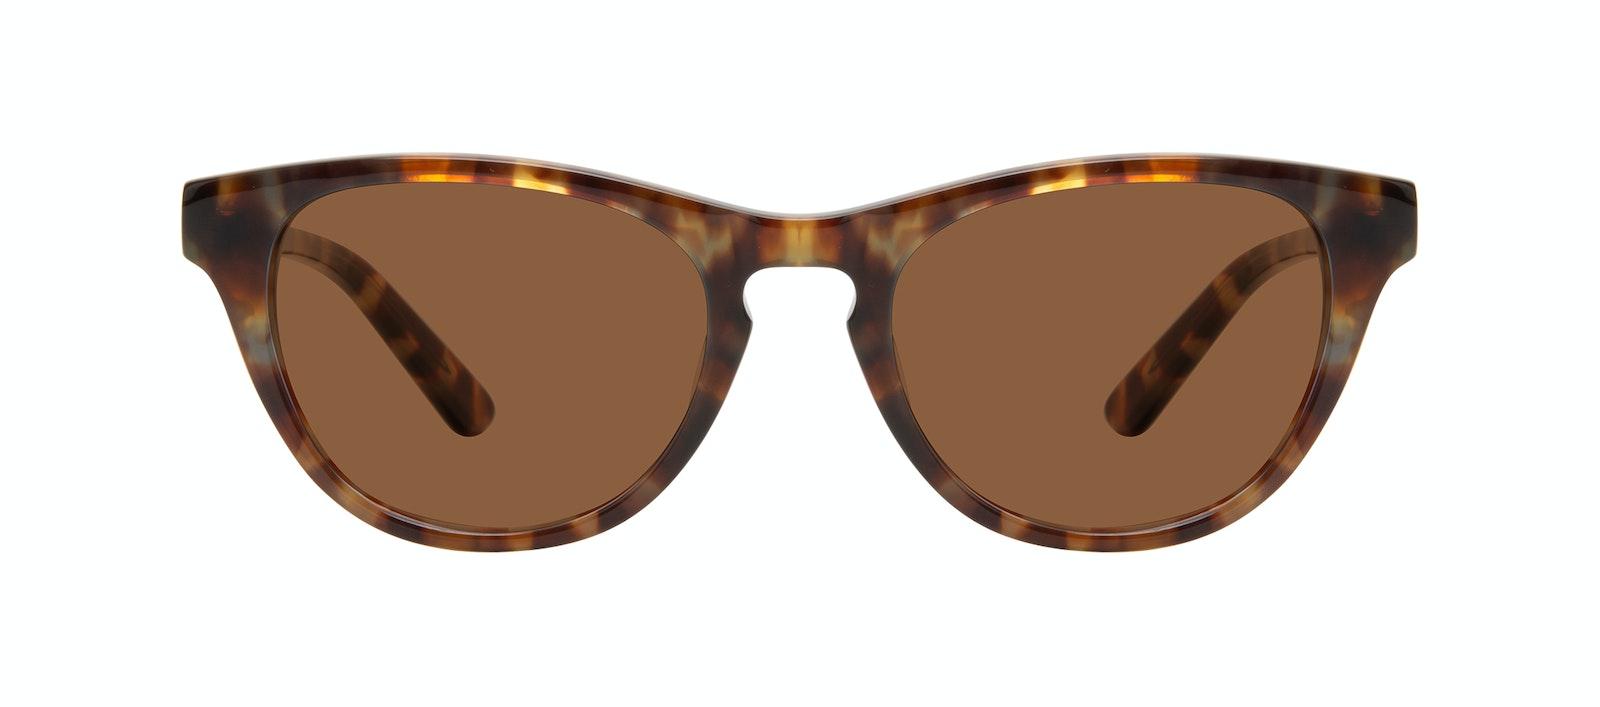 Affordable Fashion Glasses Cat Eye Sunglasses Women Selfie Tortoise Front